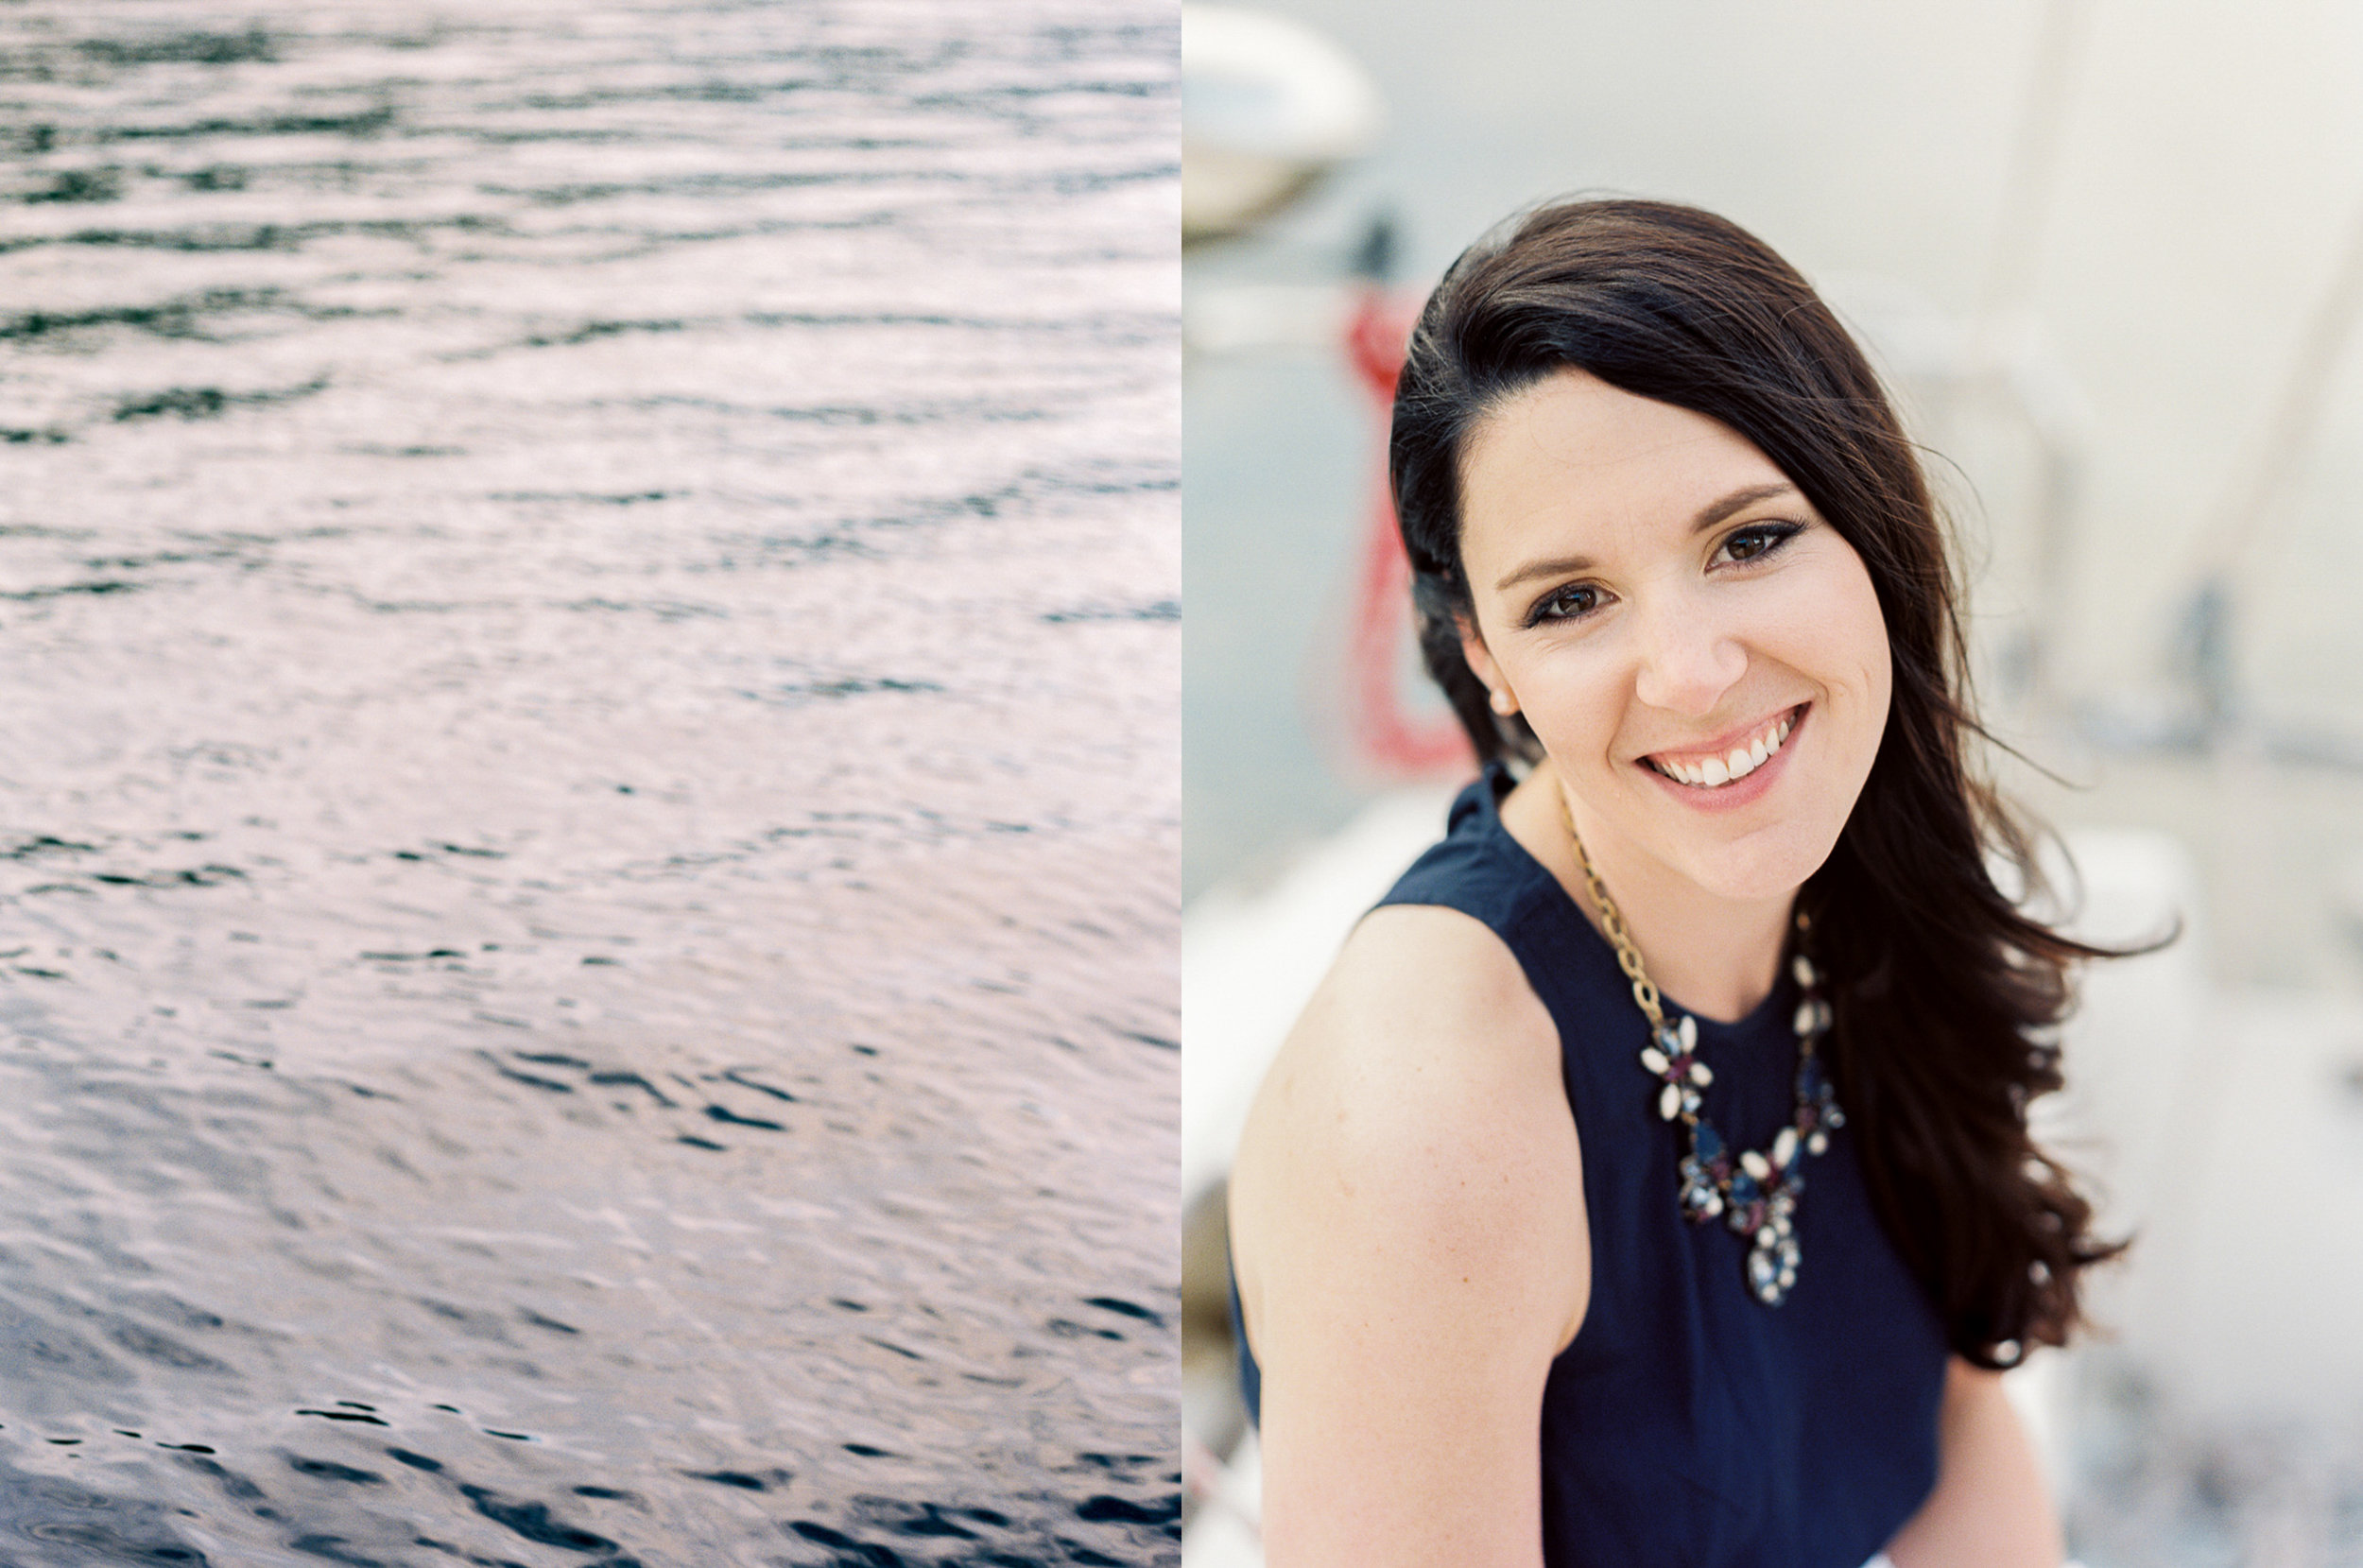 smith-mountain-lake-sailboat-engagement-session-charlotte-sailing-photographer-15.jpg